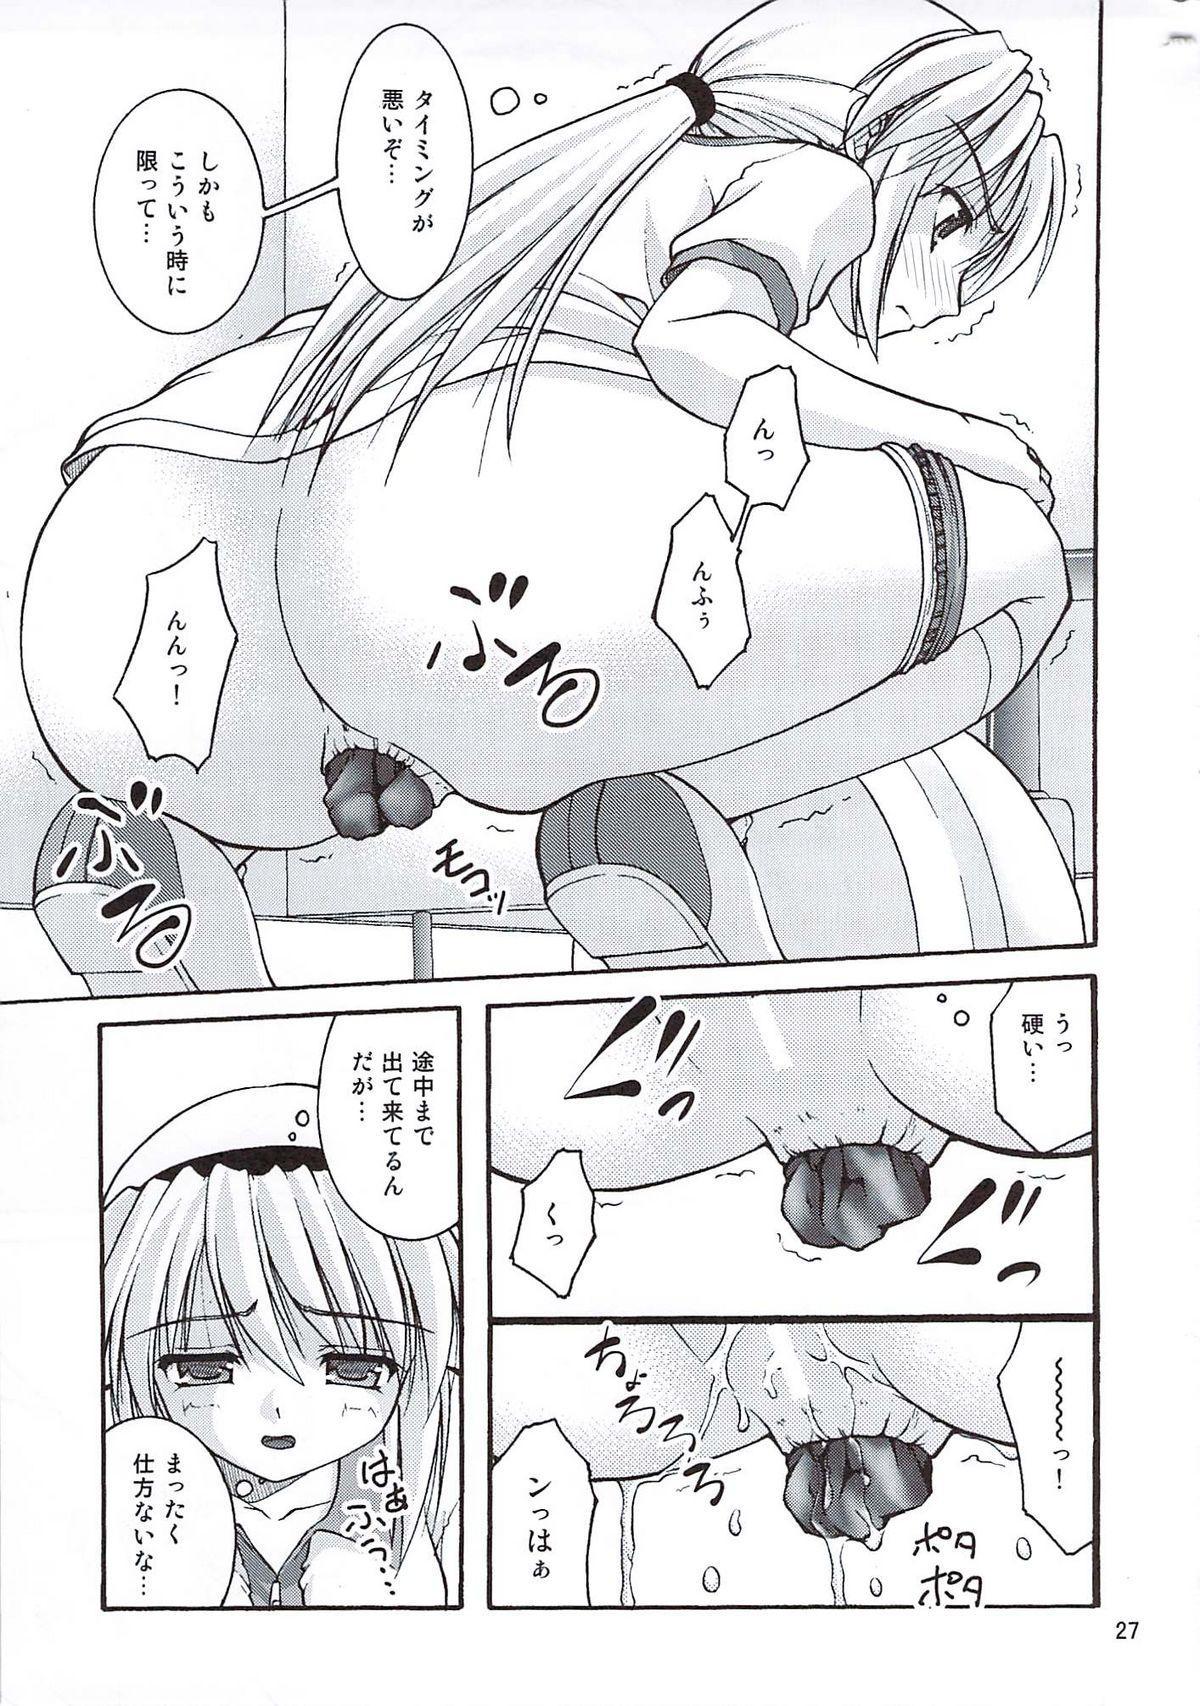 Bou Yuumei Koukou Joshi Toilet Tousatsu 2-jigen Bishoujo Hen Vol. 4 25